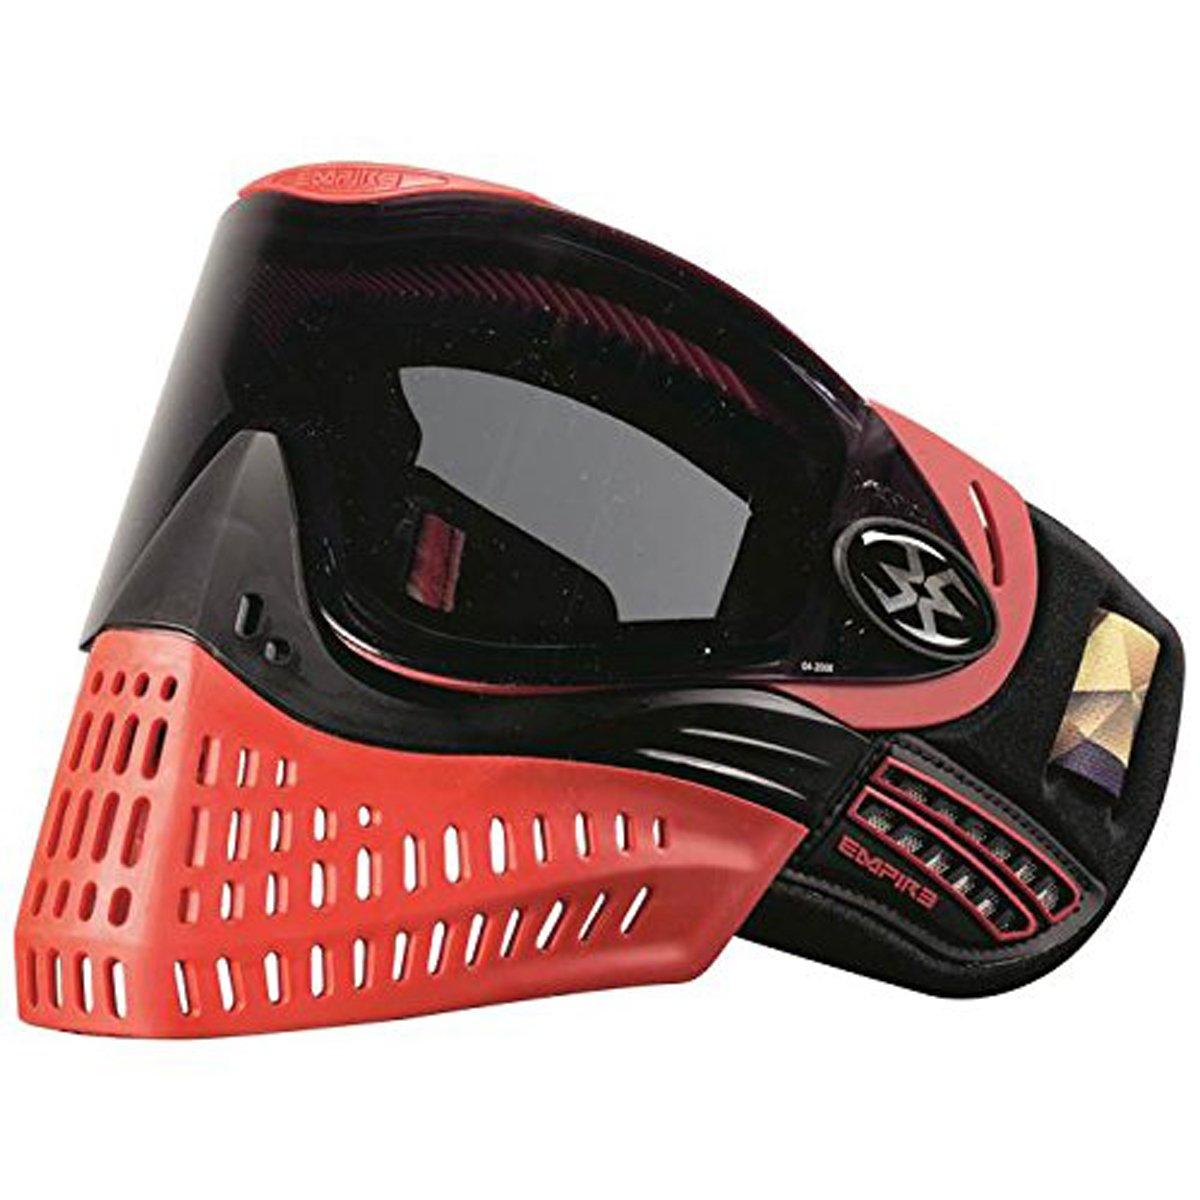 Empire E-Flex Paintball Goggle Mask - Red/Black